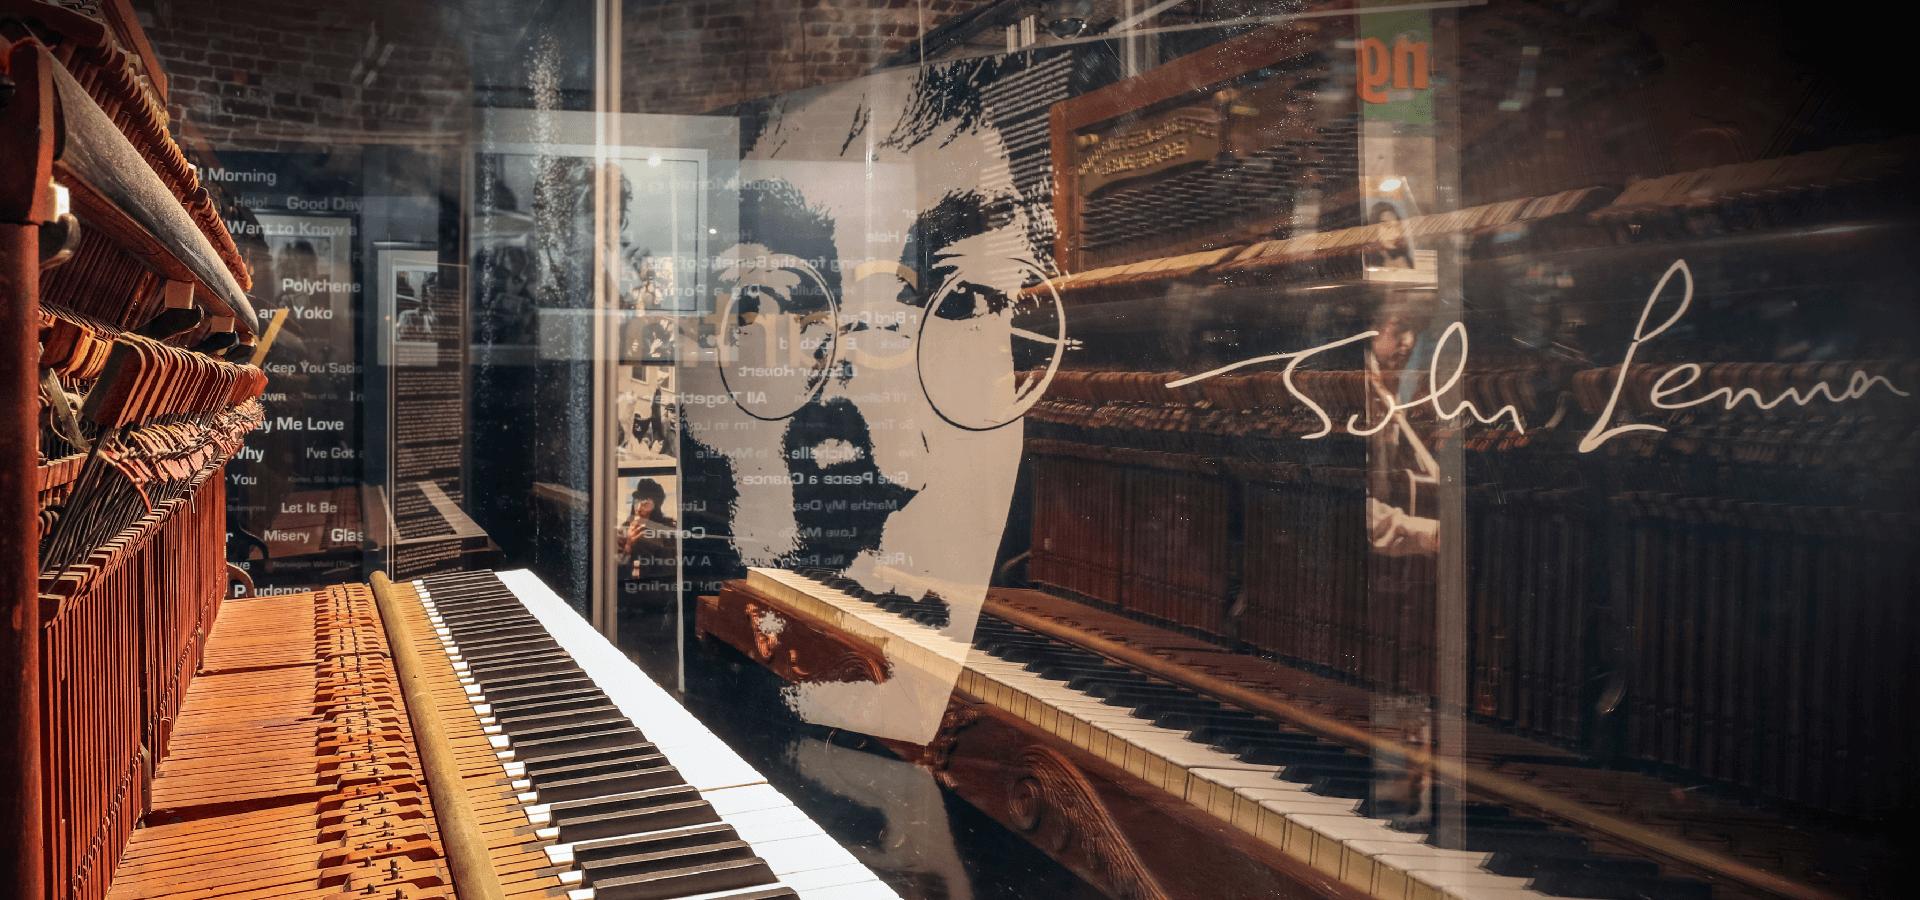 Get Back: John Lennon's last piano